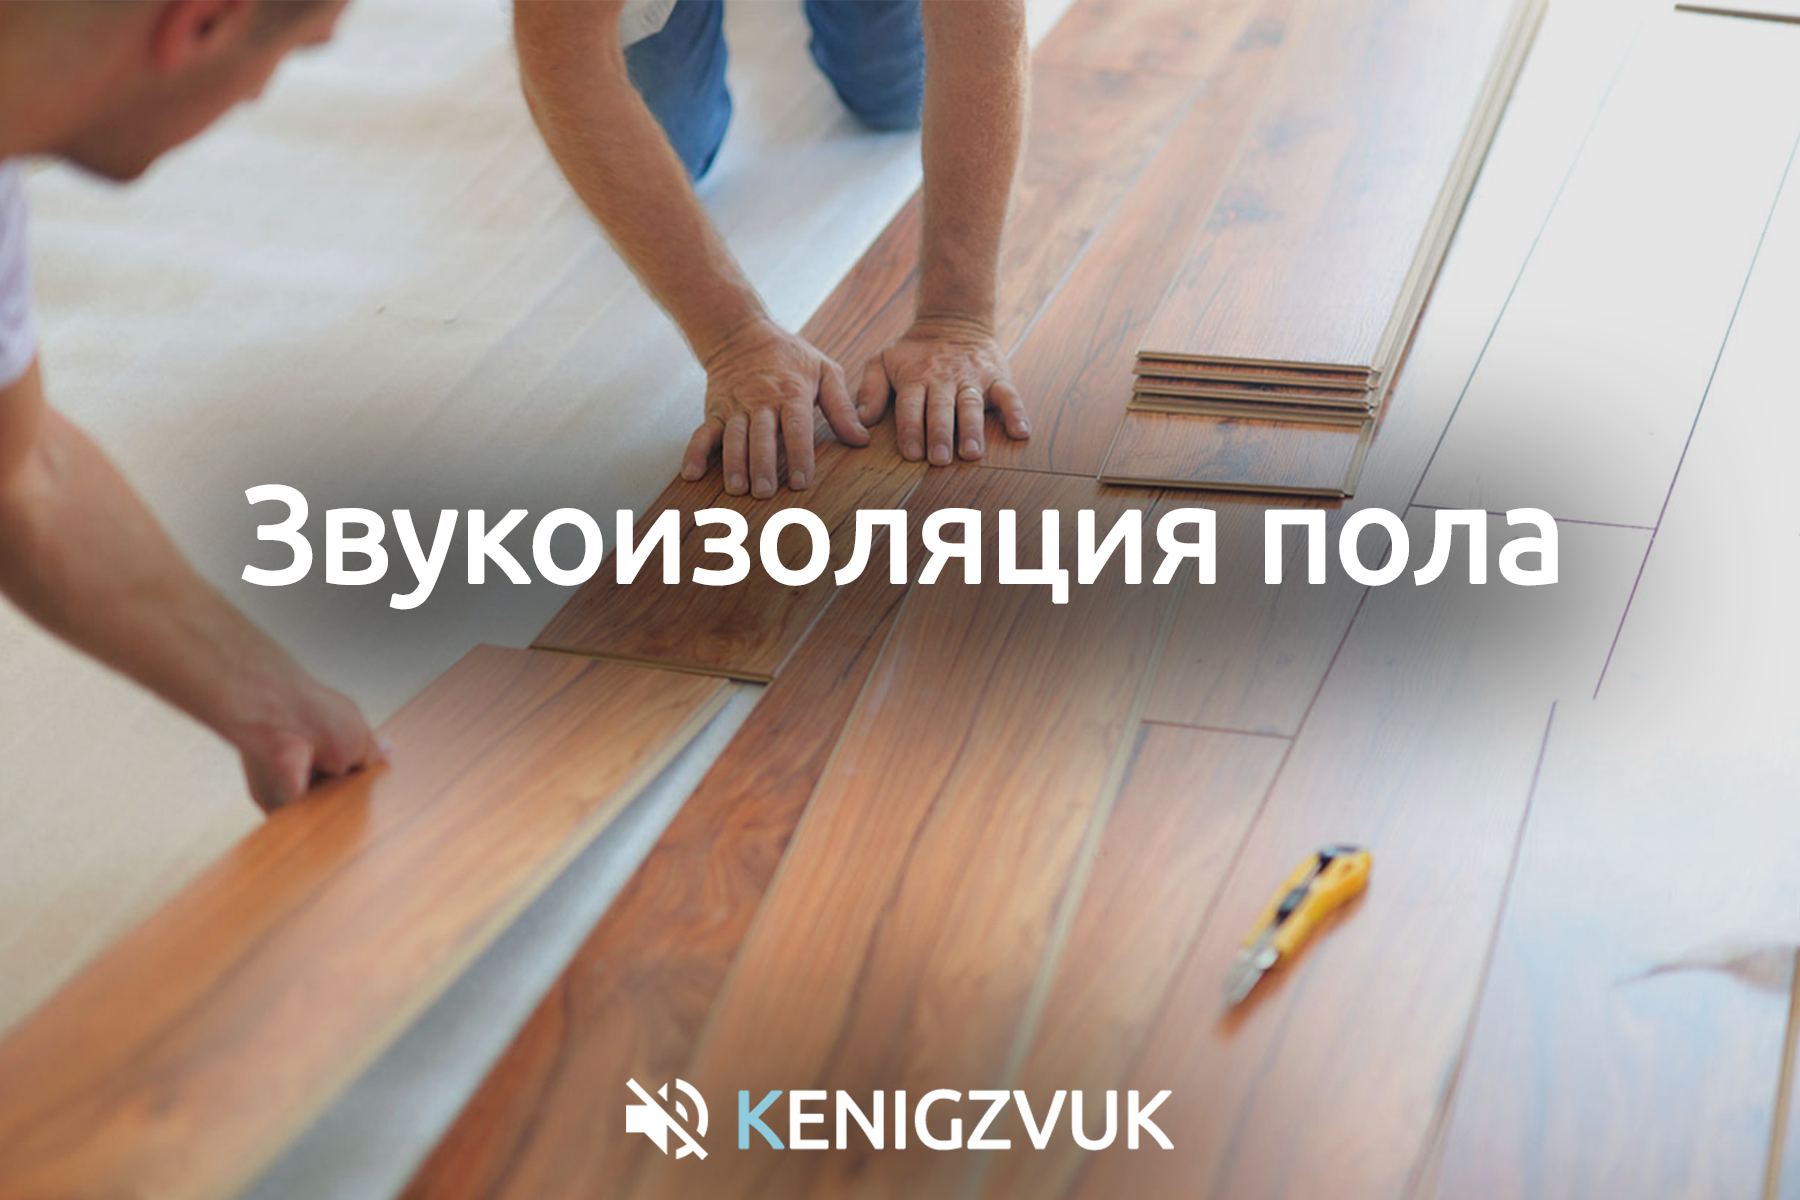 KenigZvuk | Звукоизоляция Калининград - Звукоизоляция пола